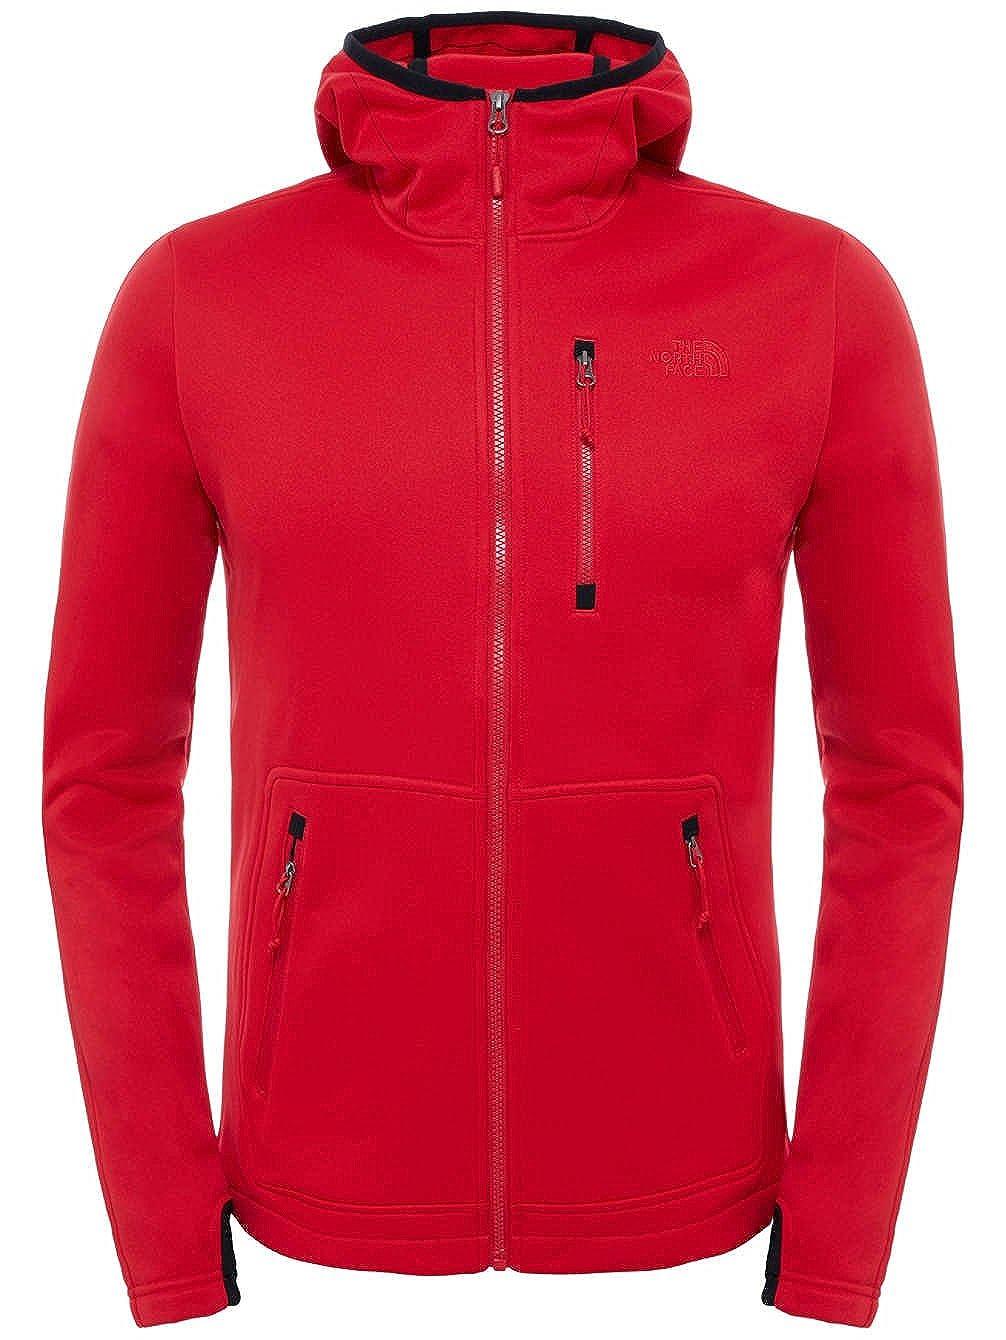 285888a0c North Face Men's Rafford Full Zipped Hoodie